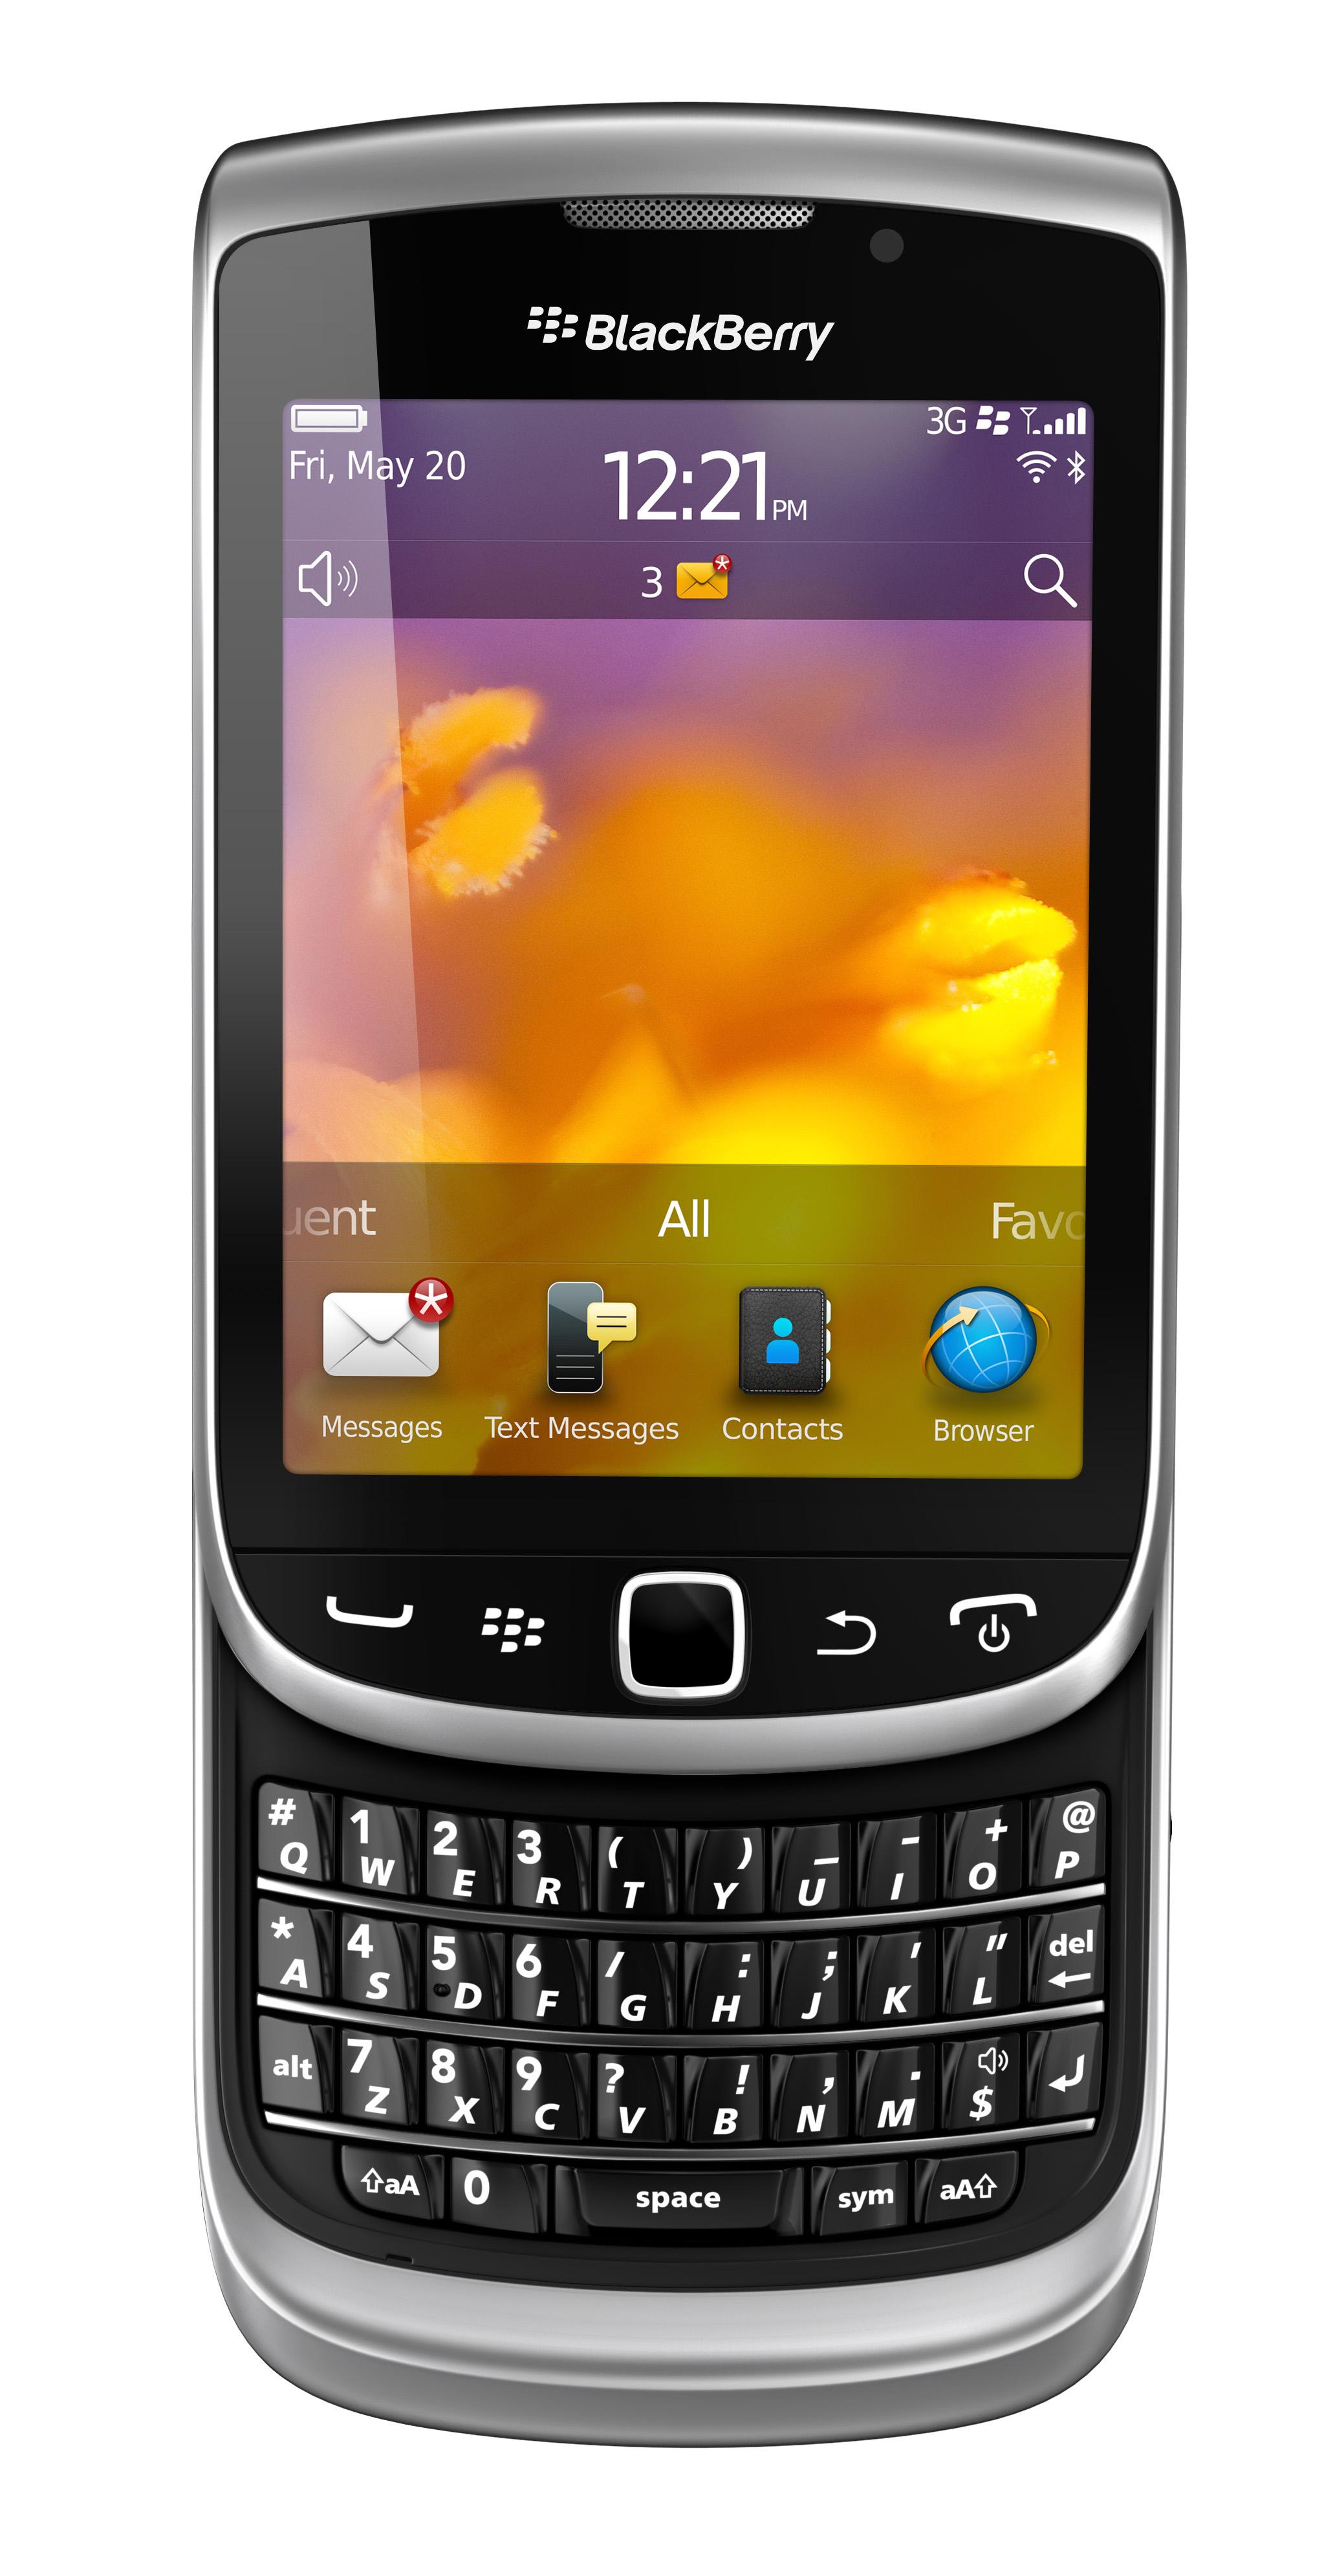 unlocked blackberry torch 9810 8gb at t t mobile qwerty smartphone rh propertyroom com Refurbished BlackBerry Torch 9810 AT&T BlackBerry Torch 9810